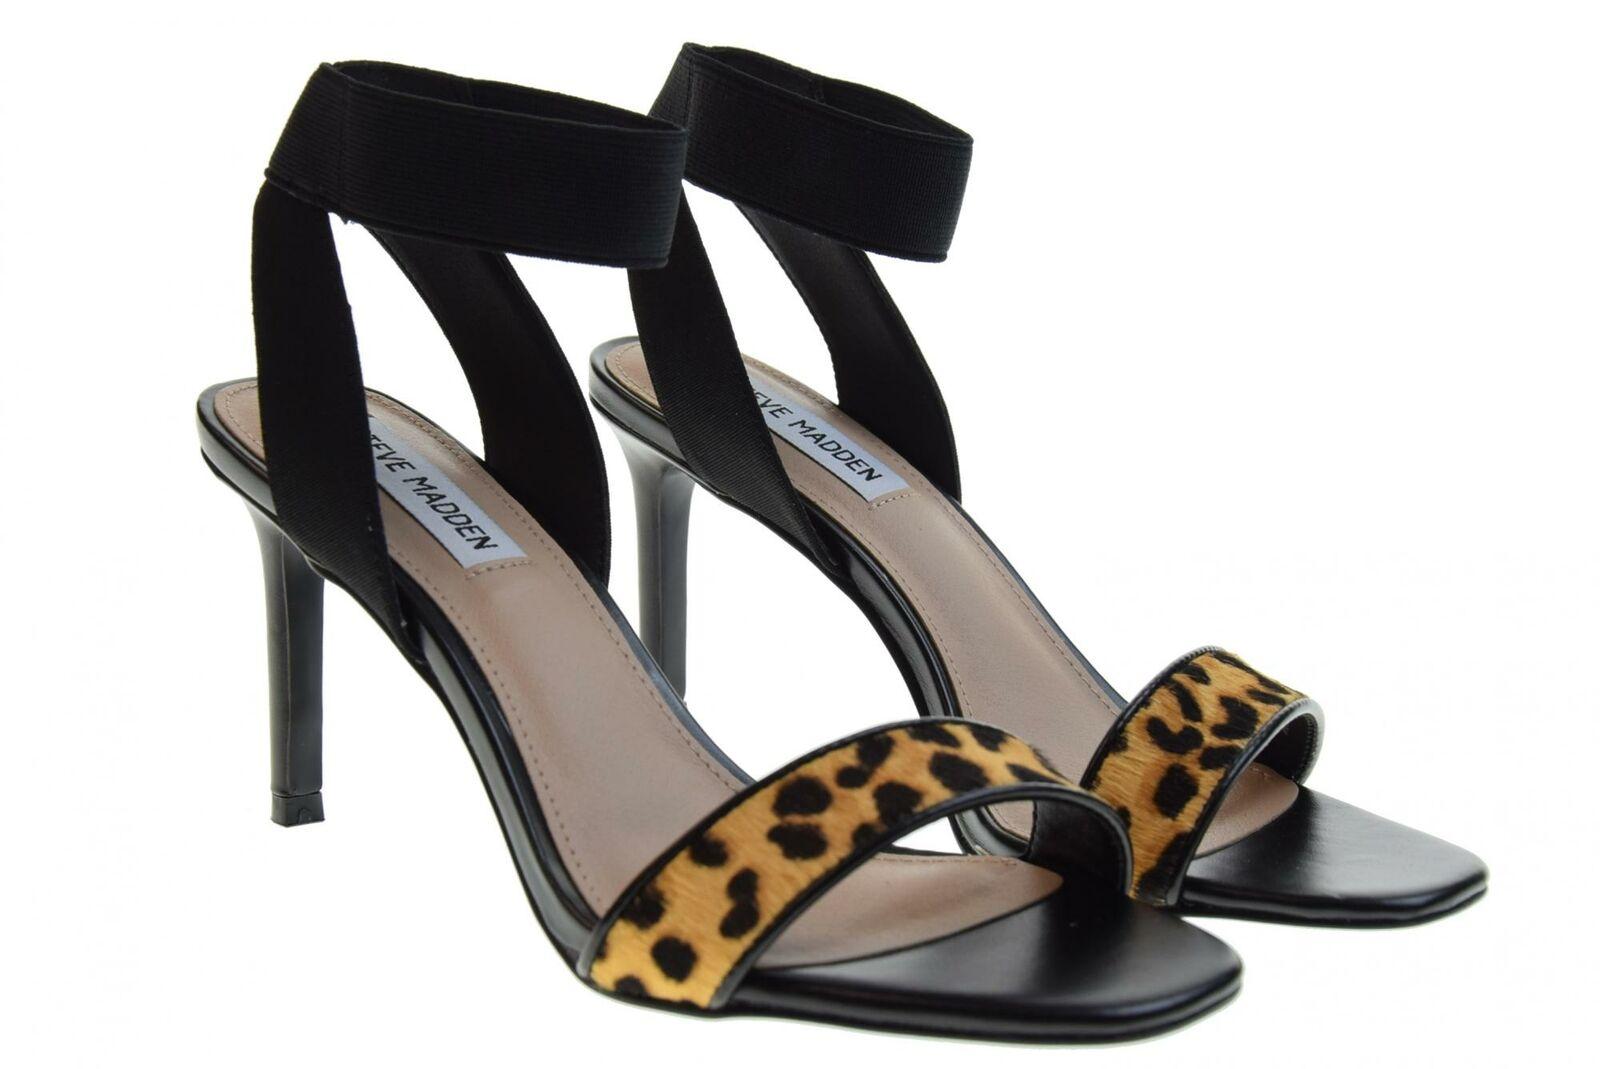 Steve madden p19f womens fade leopardato sandals heels